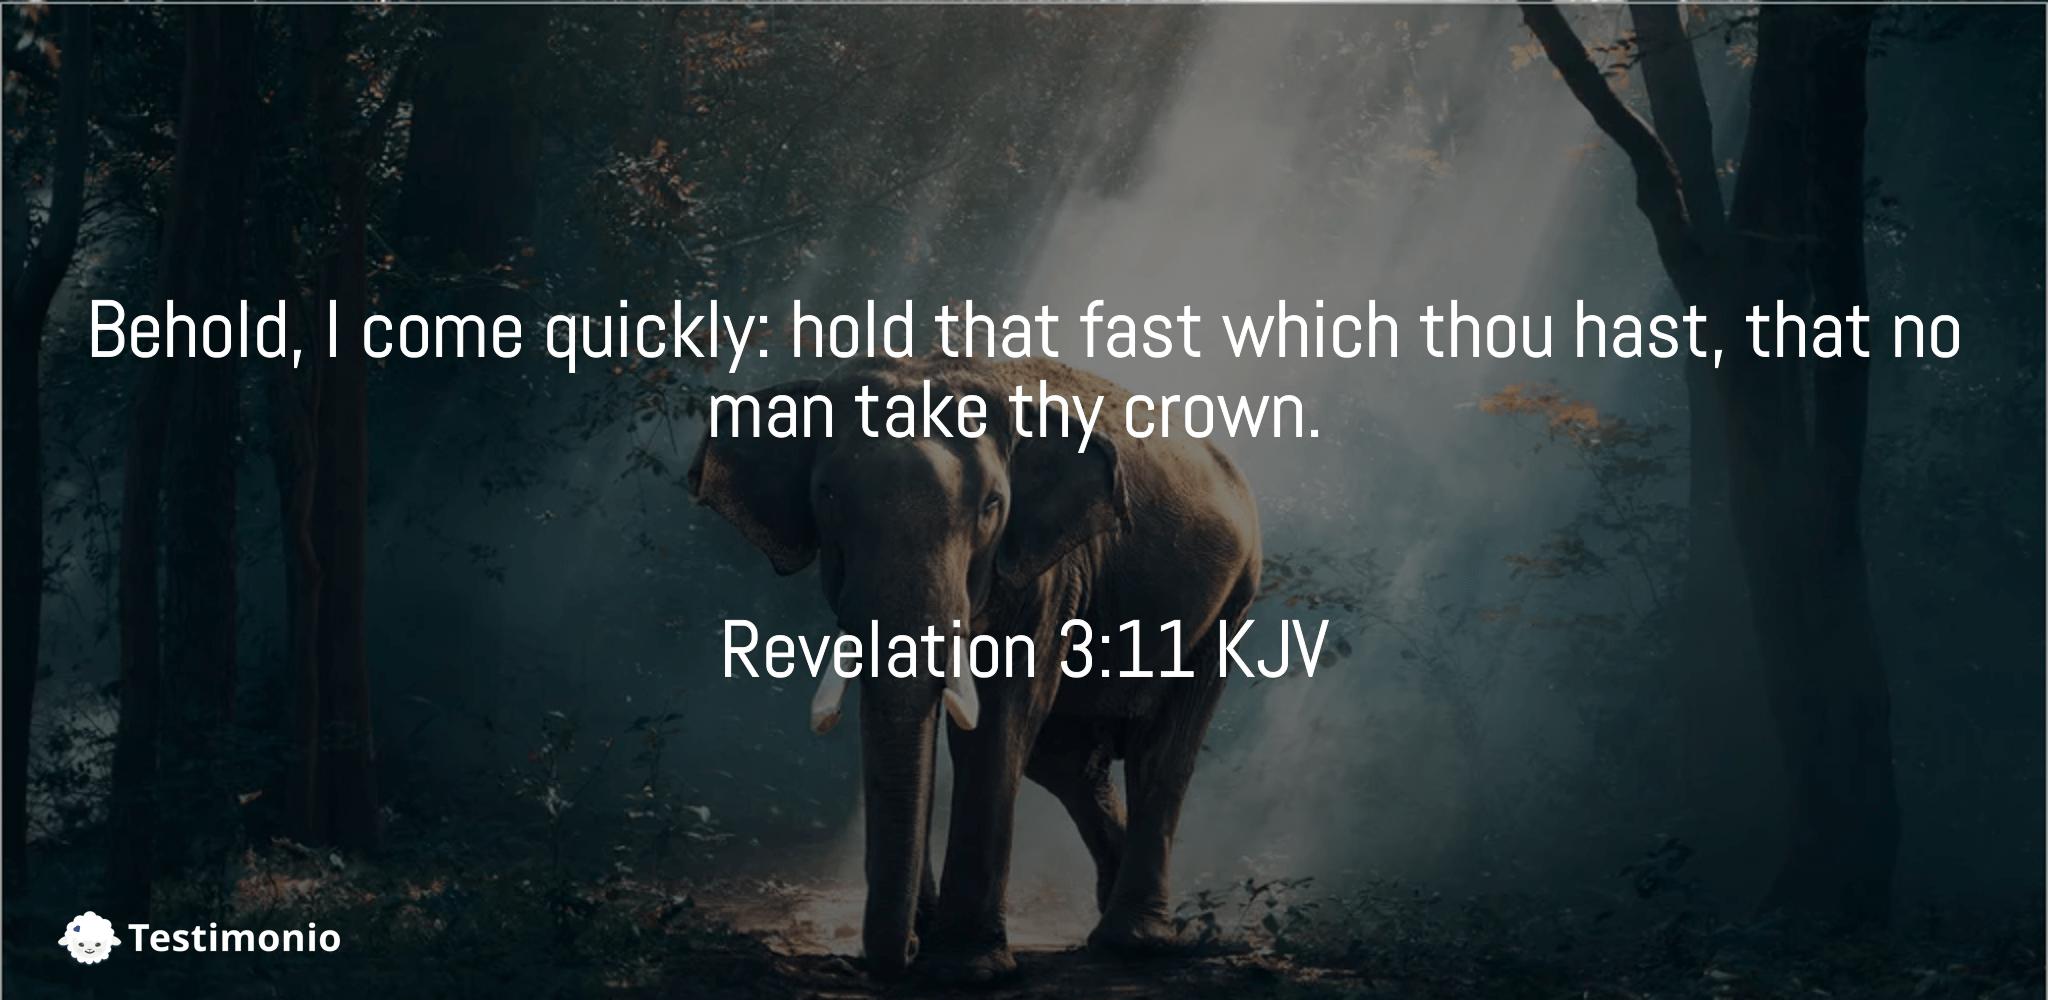 Revelation 3:11